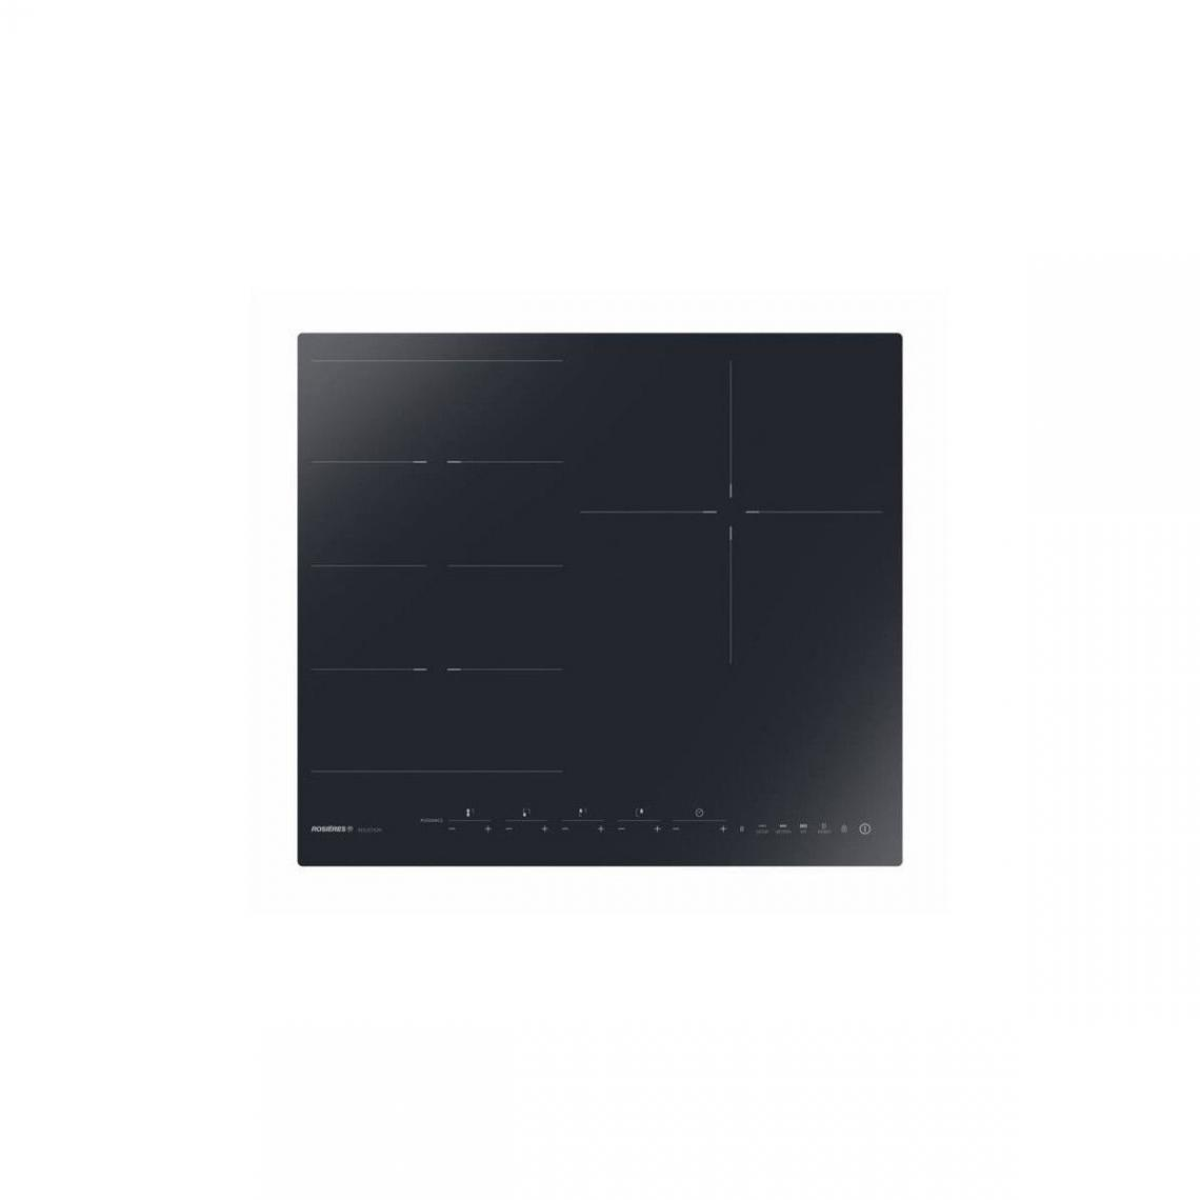 Rosieres Rosieres - Ried340b1c - Table Induction - 3 Foyers - L60cm - Flex + 1 - Noir